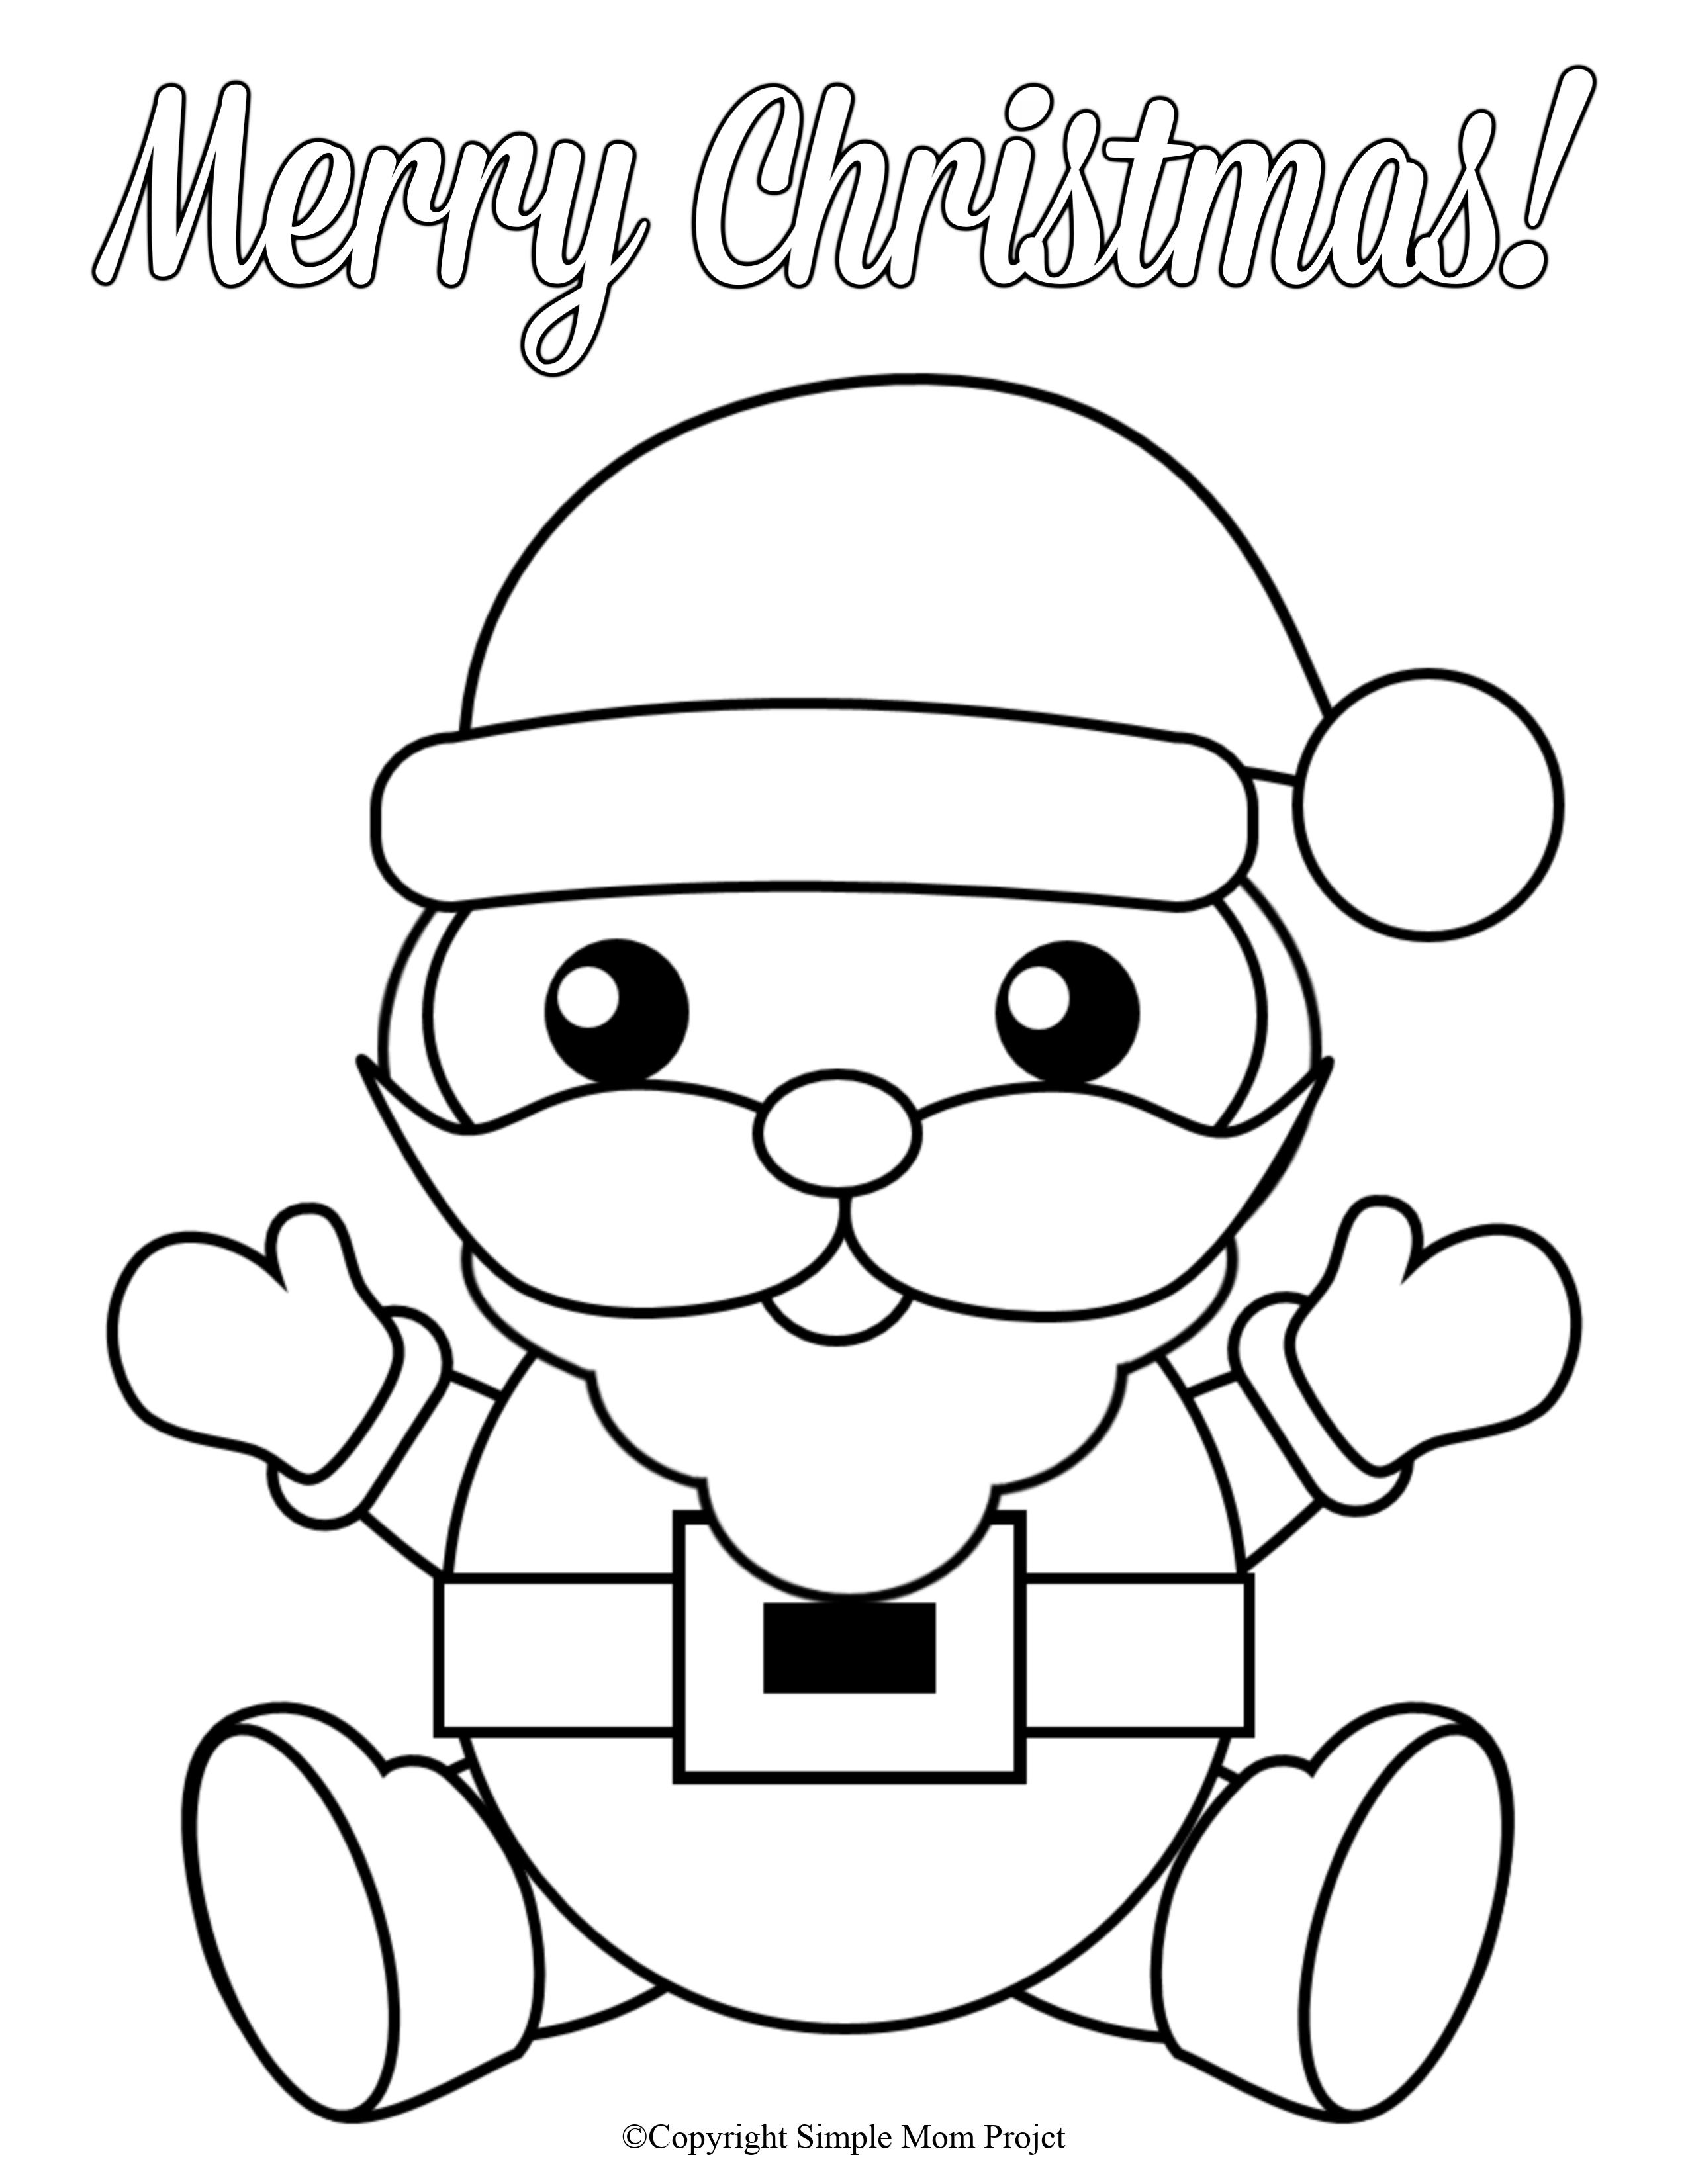 Free Printable Santa Claus Coloring Sheet for Kids